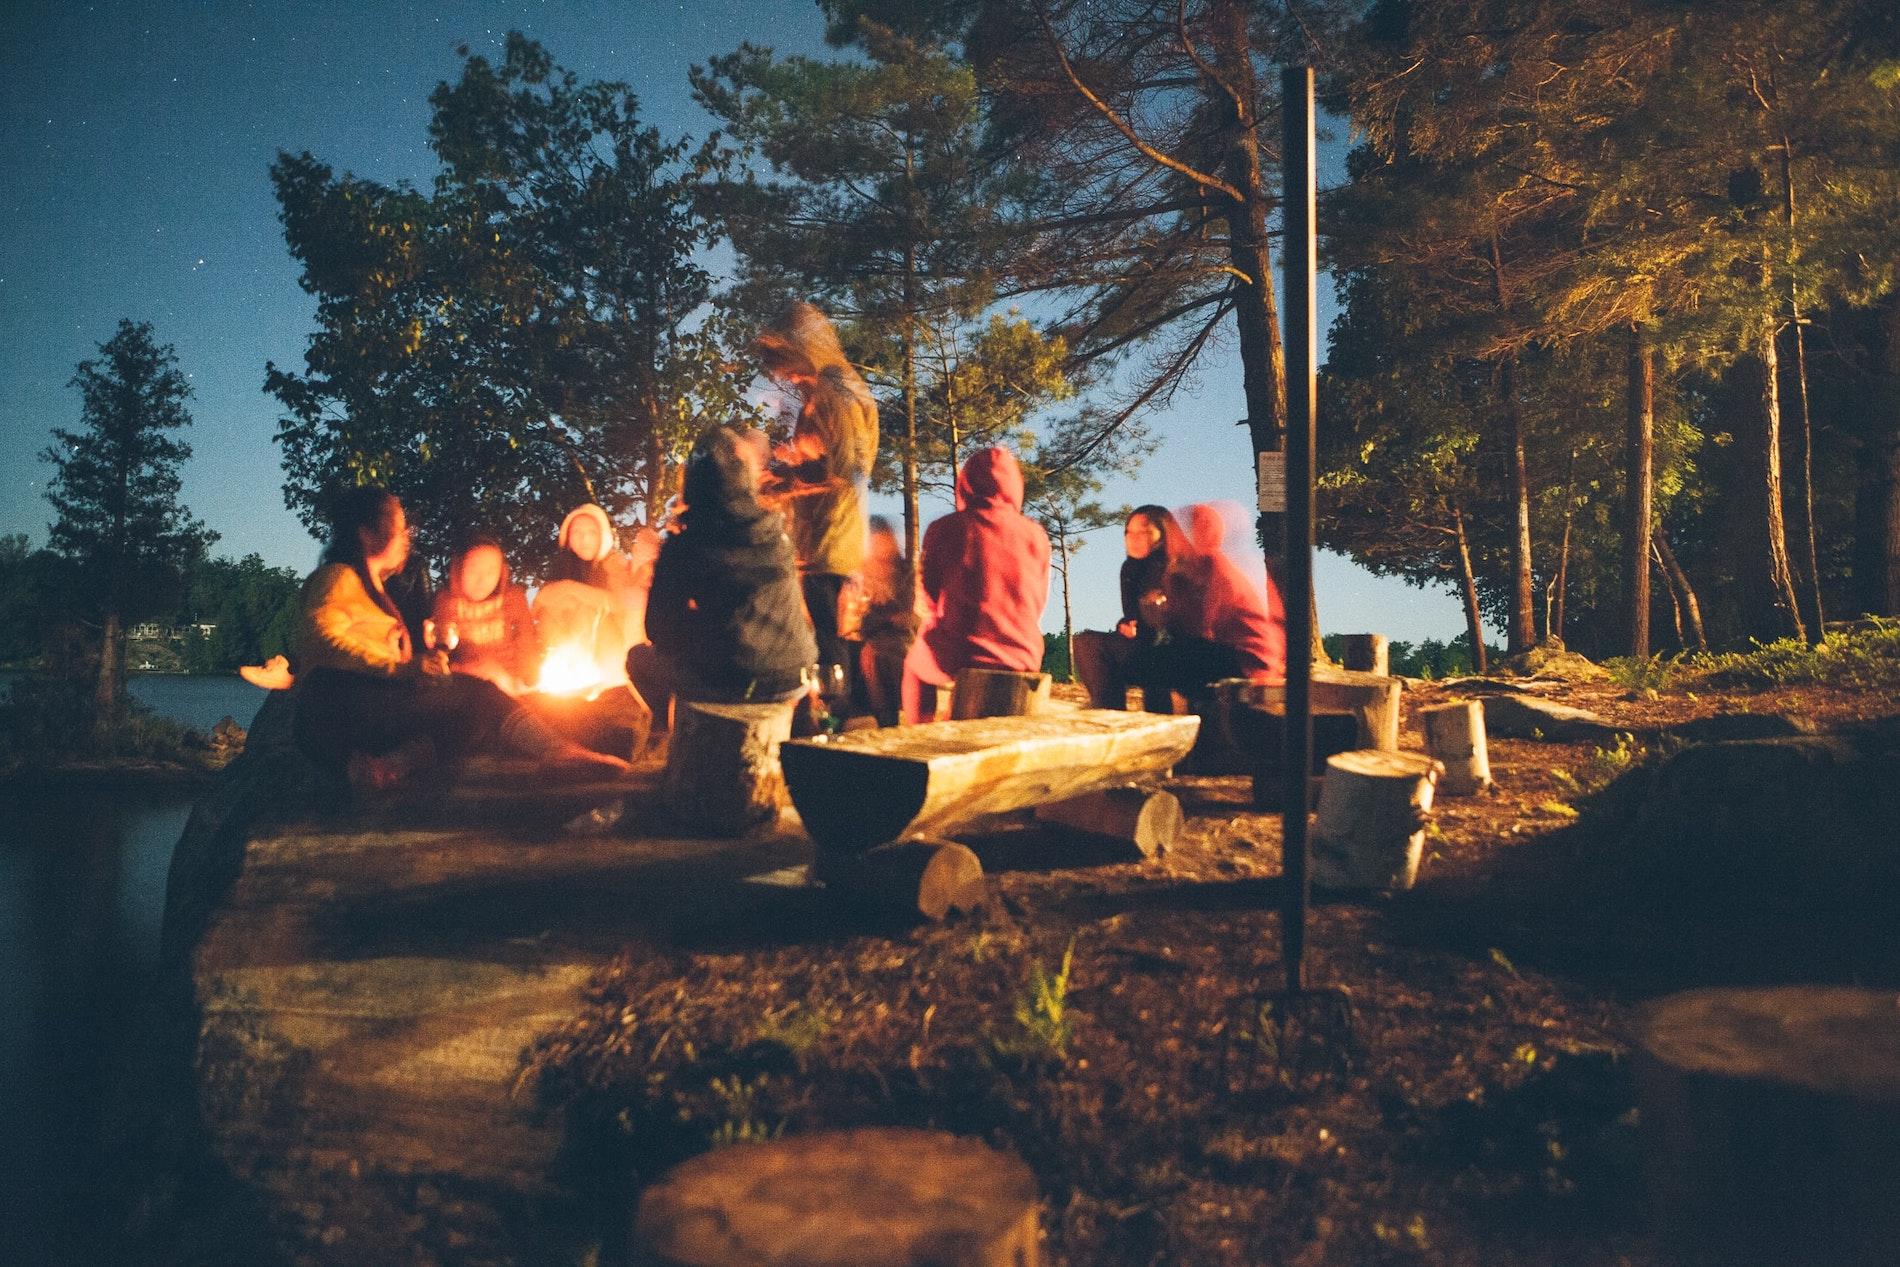 camping kids around a fire